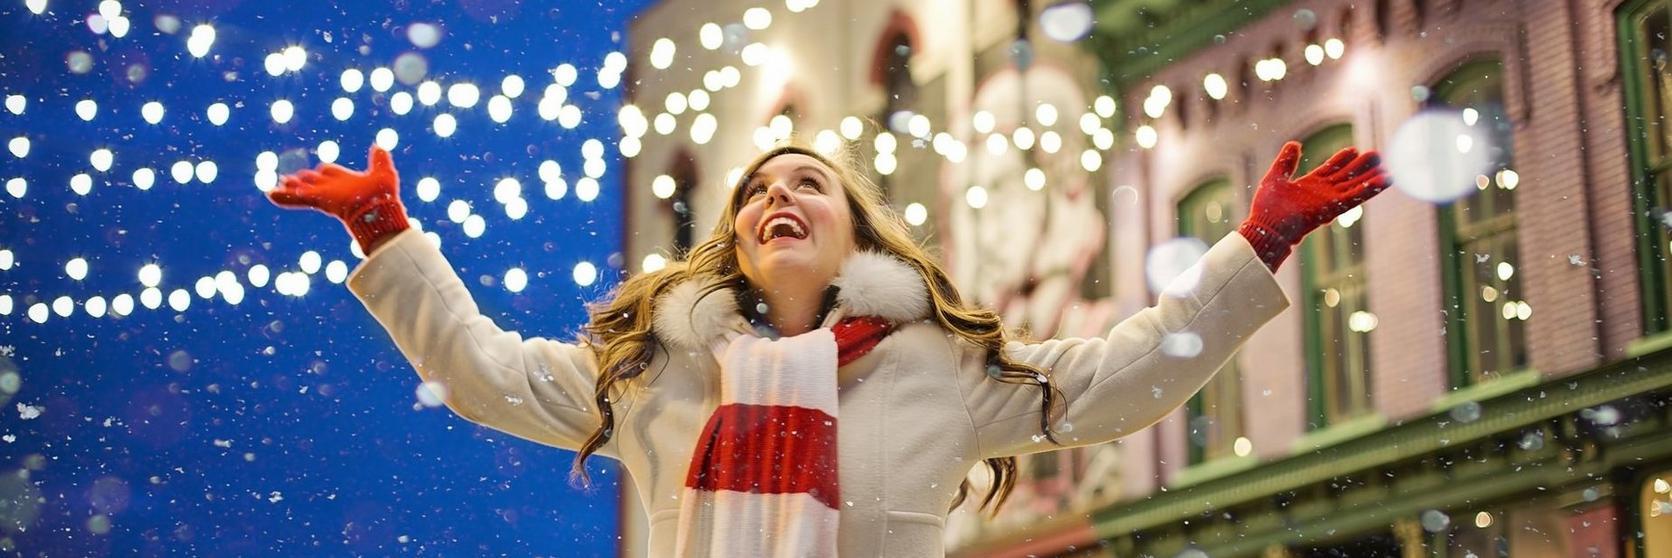 happy-christmas-woman